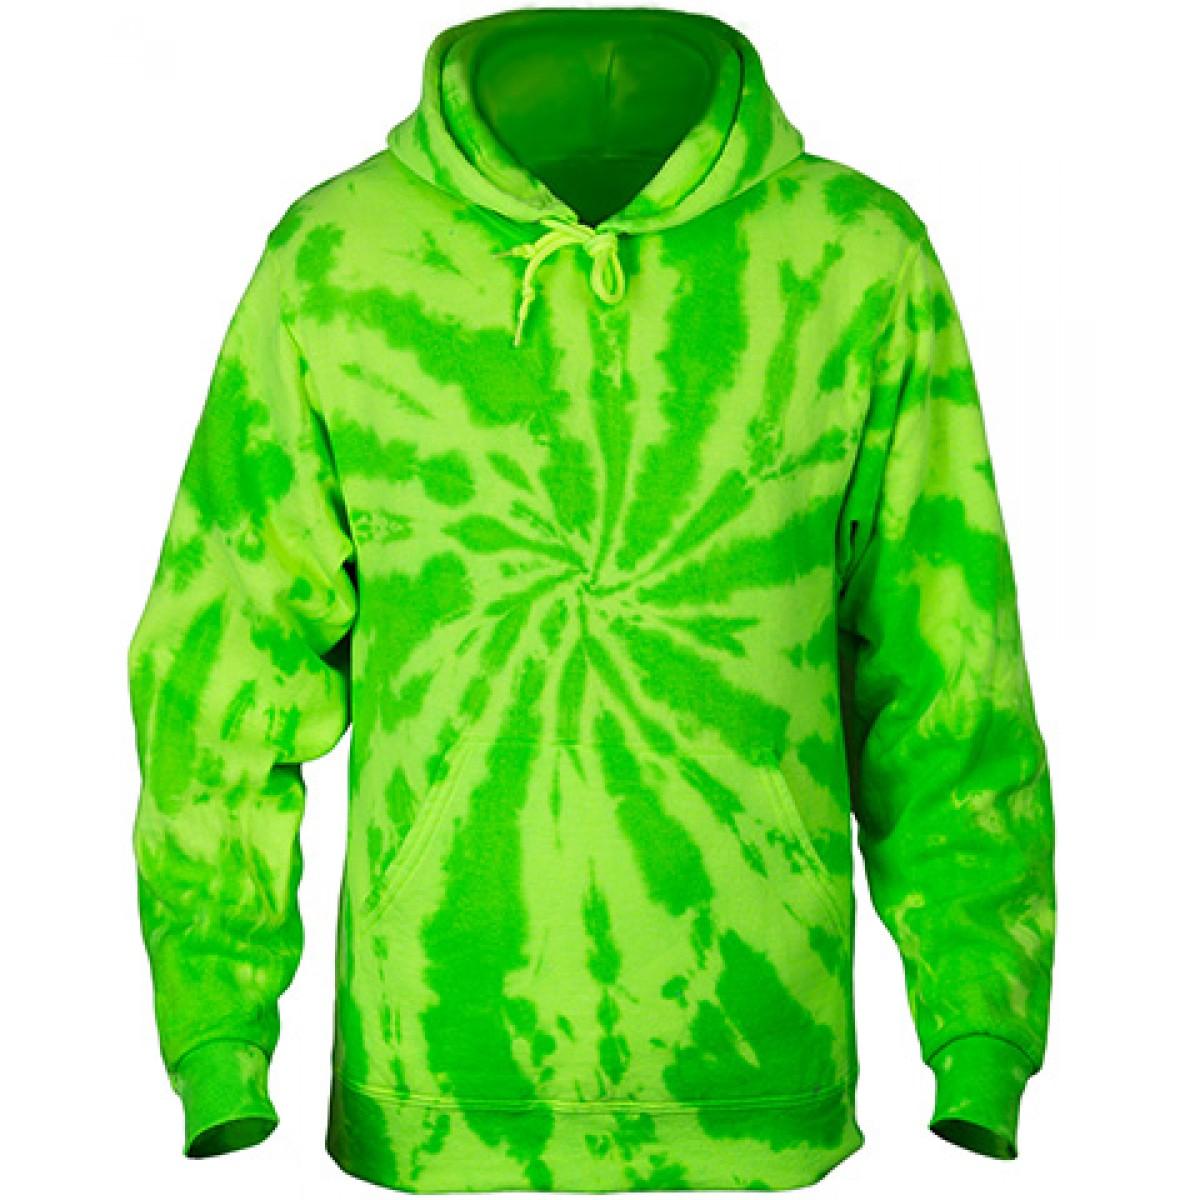 Tie-Dye Pullover Hooded Sweatshirt-Neon Green-YS